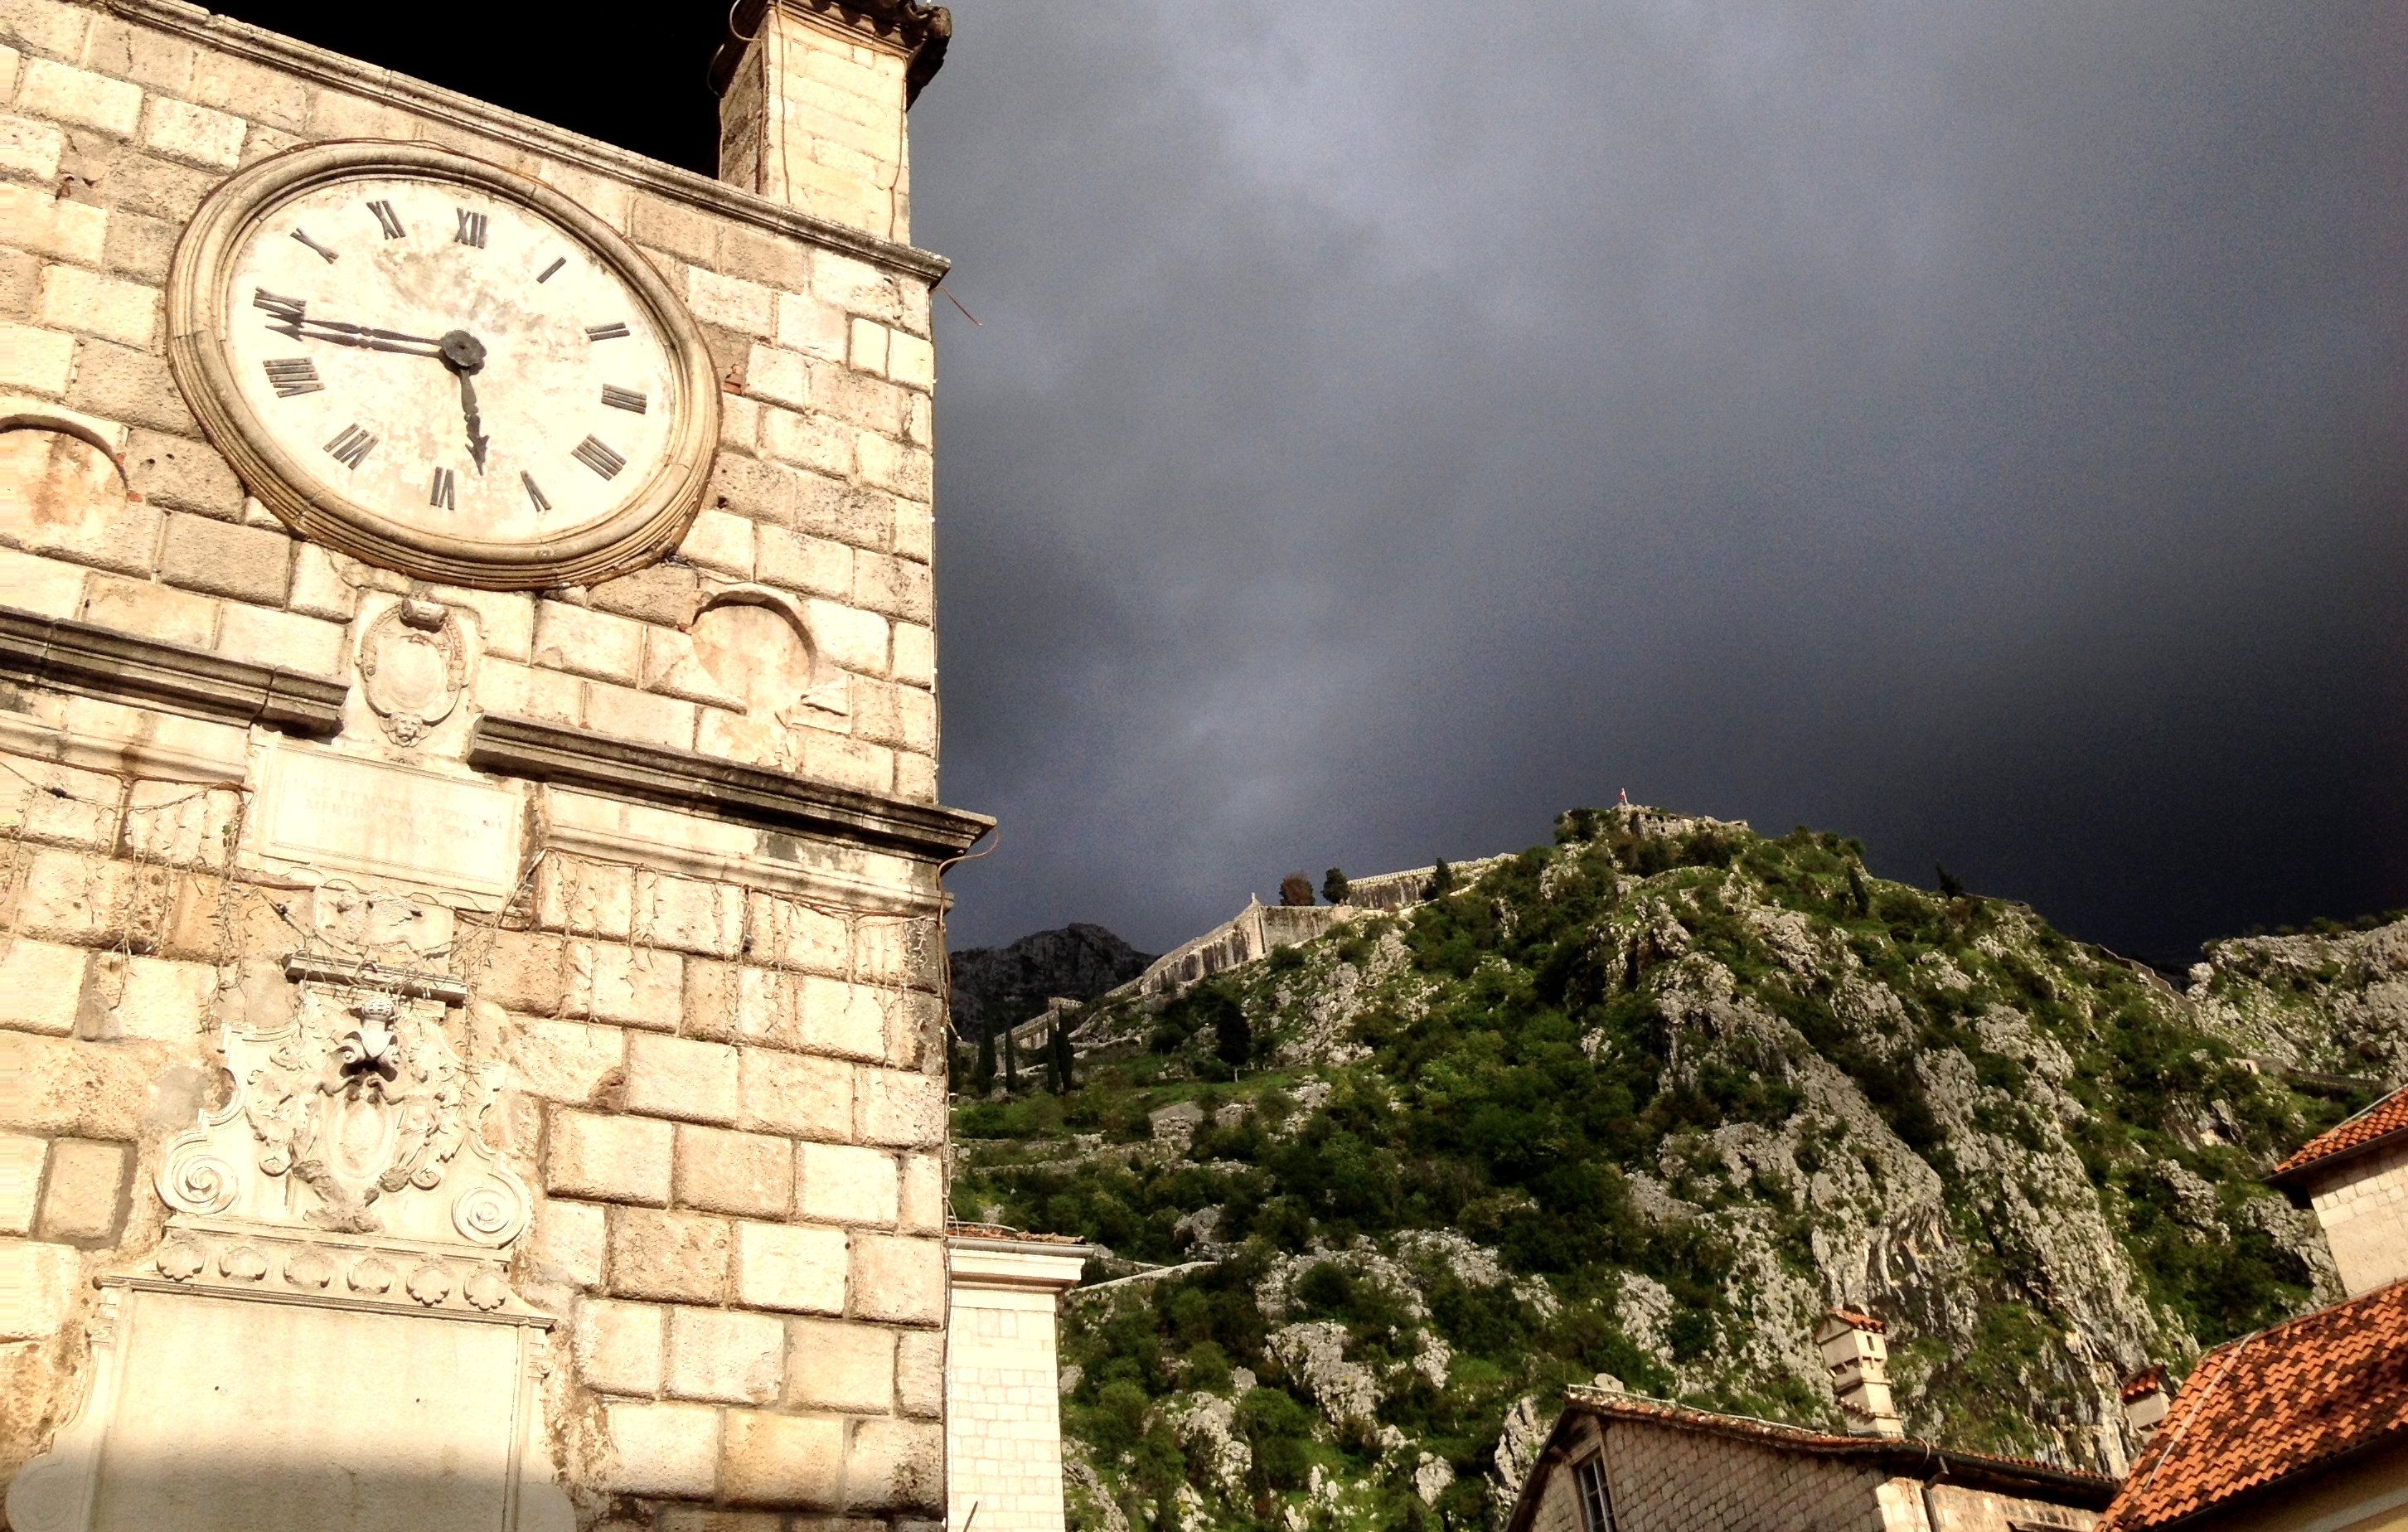 Balkan Trip à Kotor horloge du clocher Monténégro